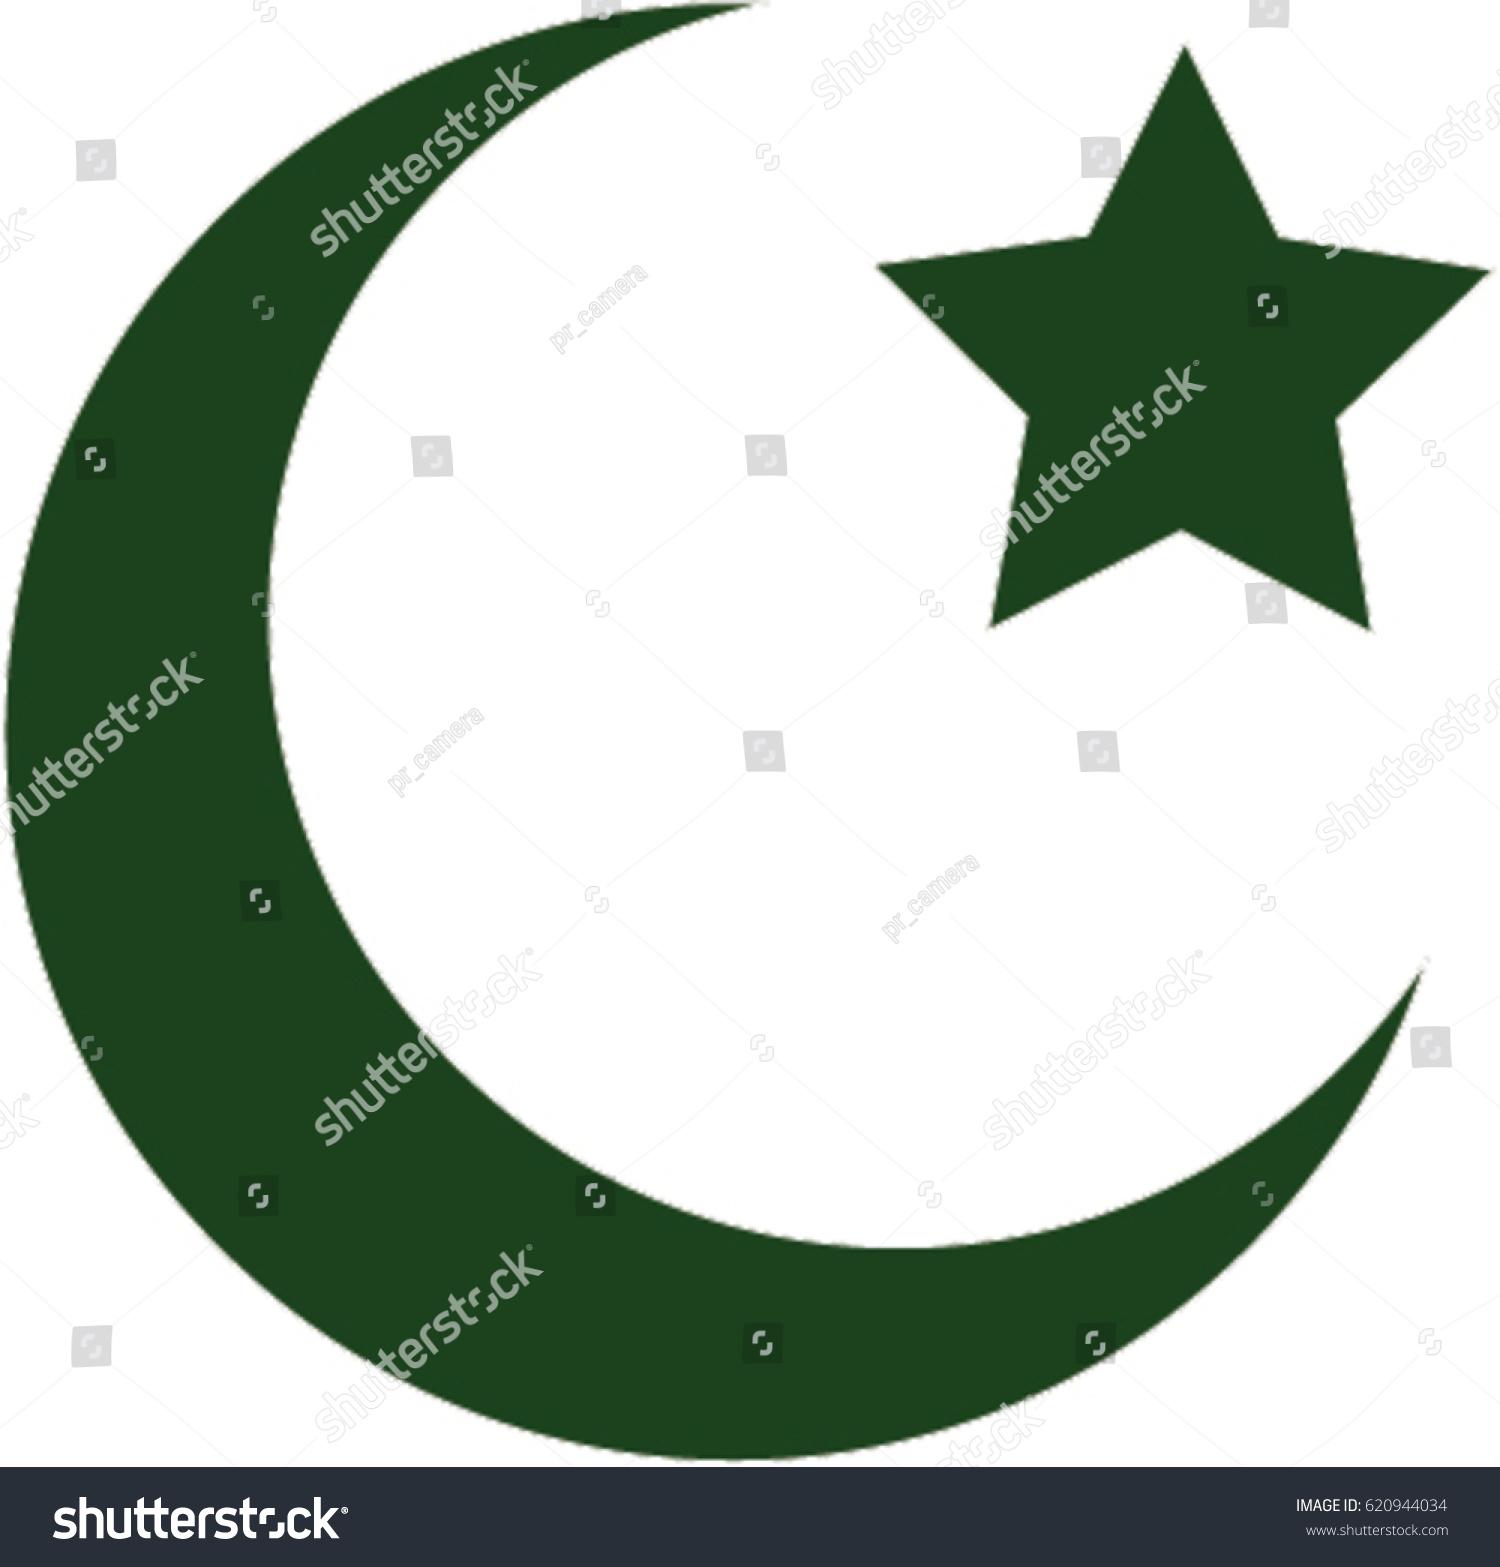 Moon star islam symbol stock vector 620944034 shutterstock moon star islam symbol buycottarizona